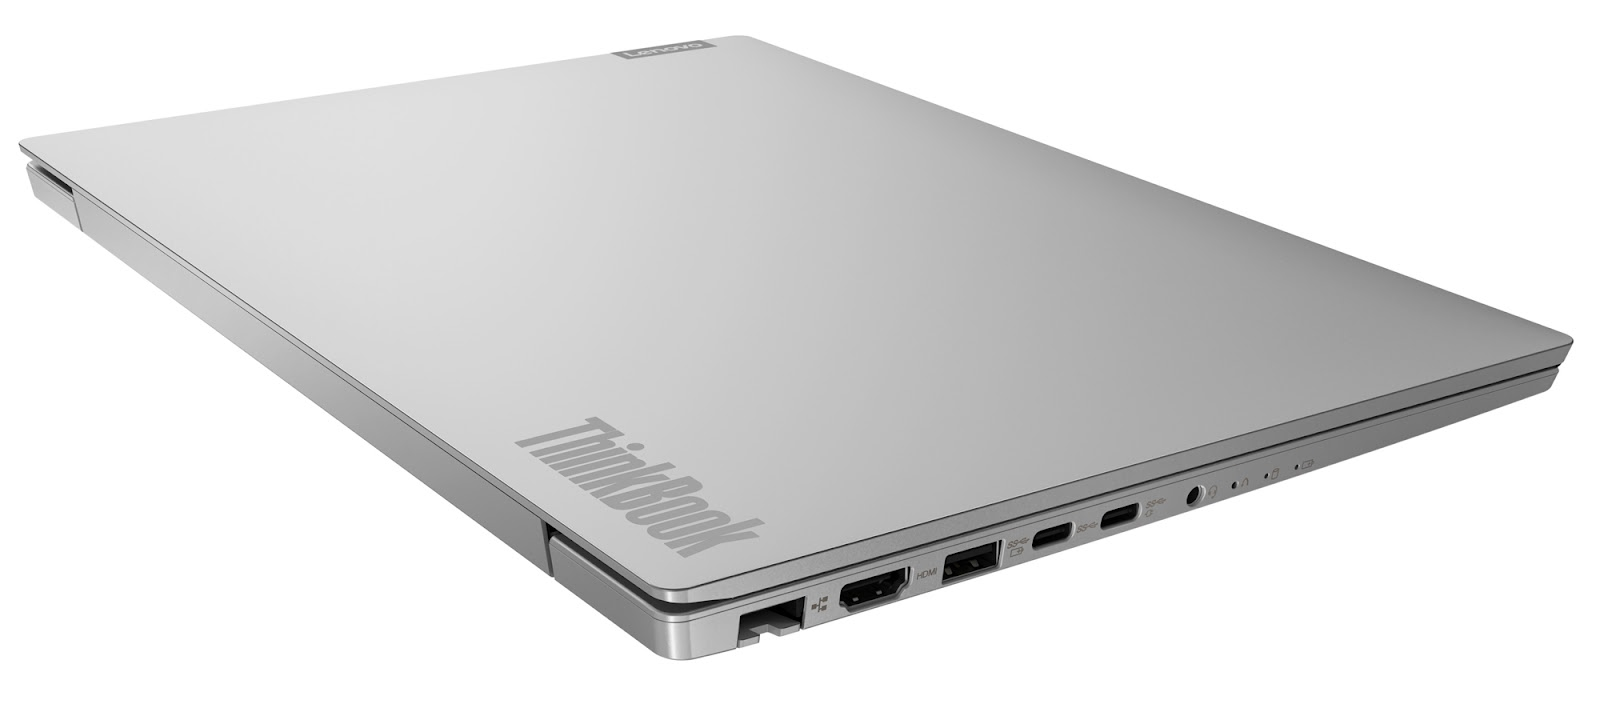 Фото 3. Ноутбук Lenovo ThinkBook 14 IIL (20SL00JURU)